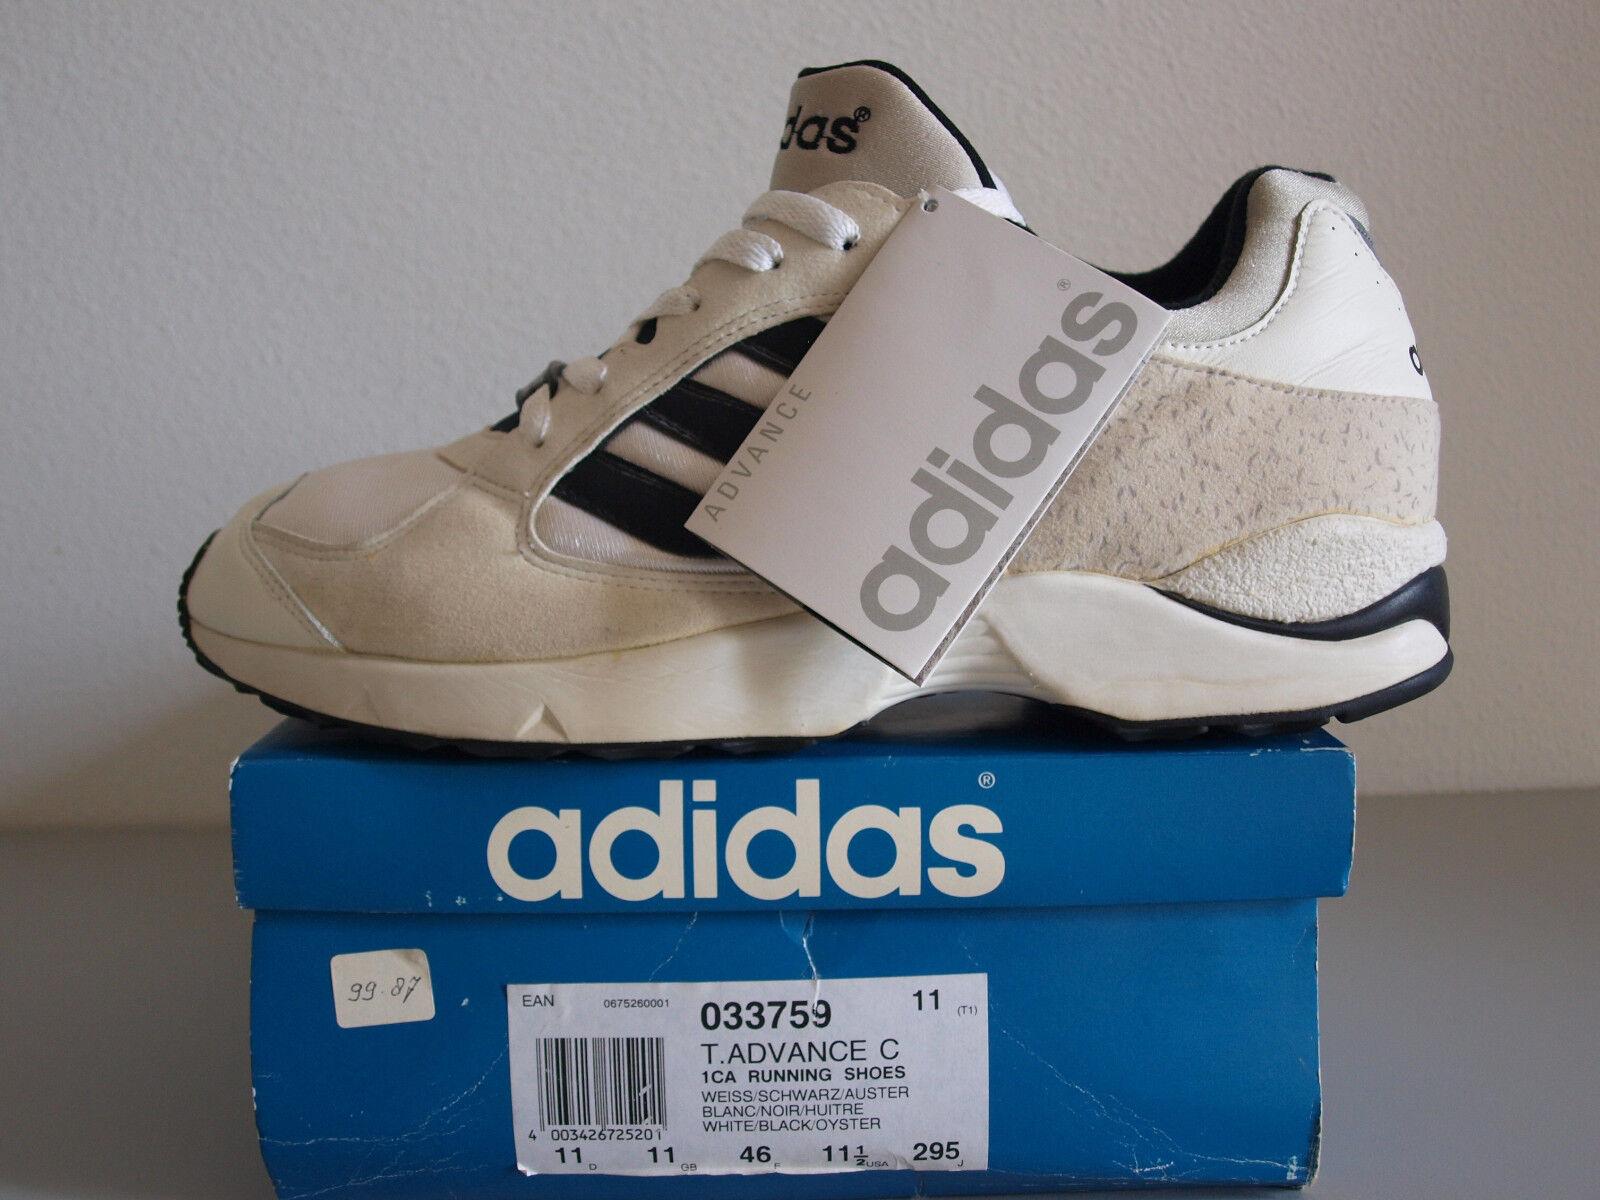 Adidas Torsion Advance C 1994 US 11.511 Vintage Worn Original Box Rare OG